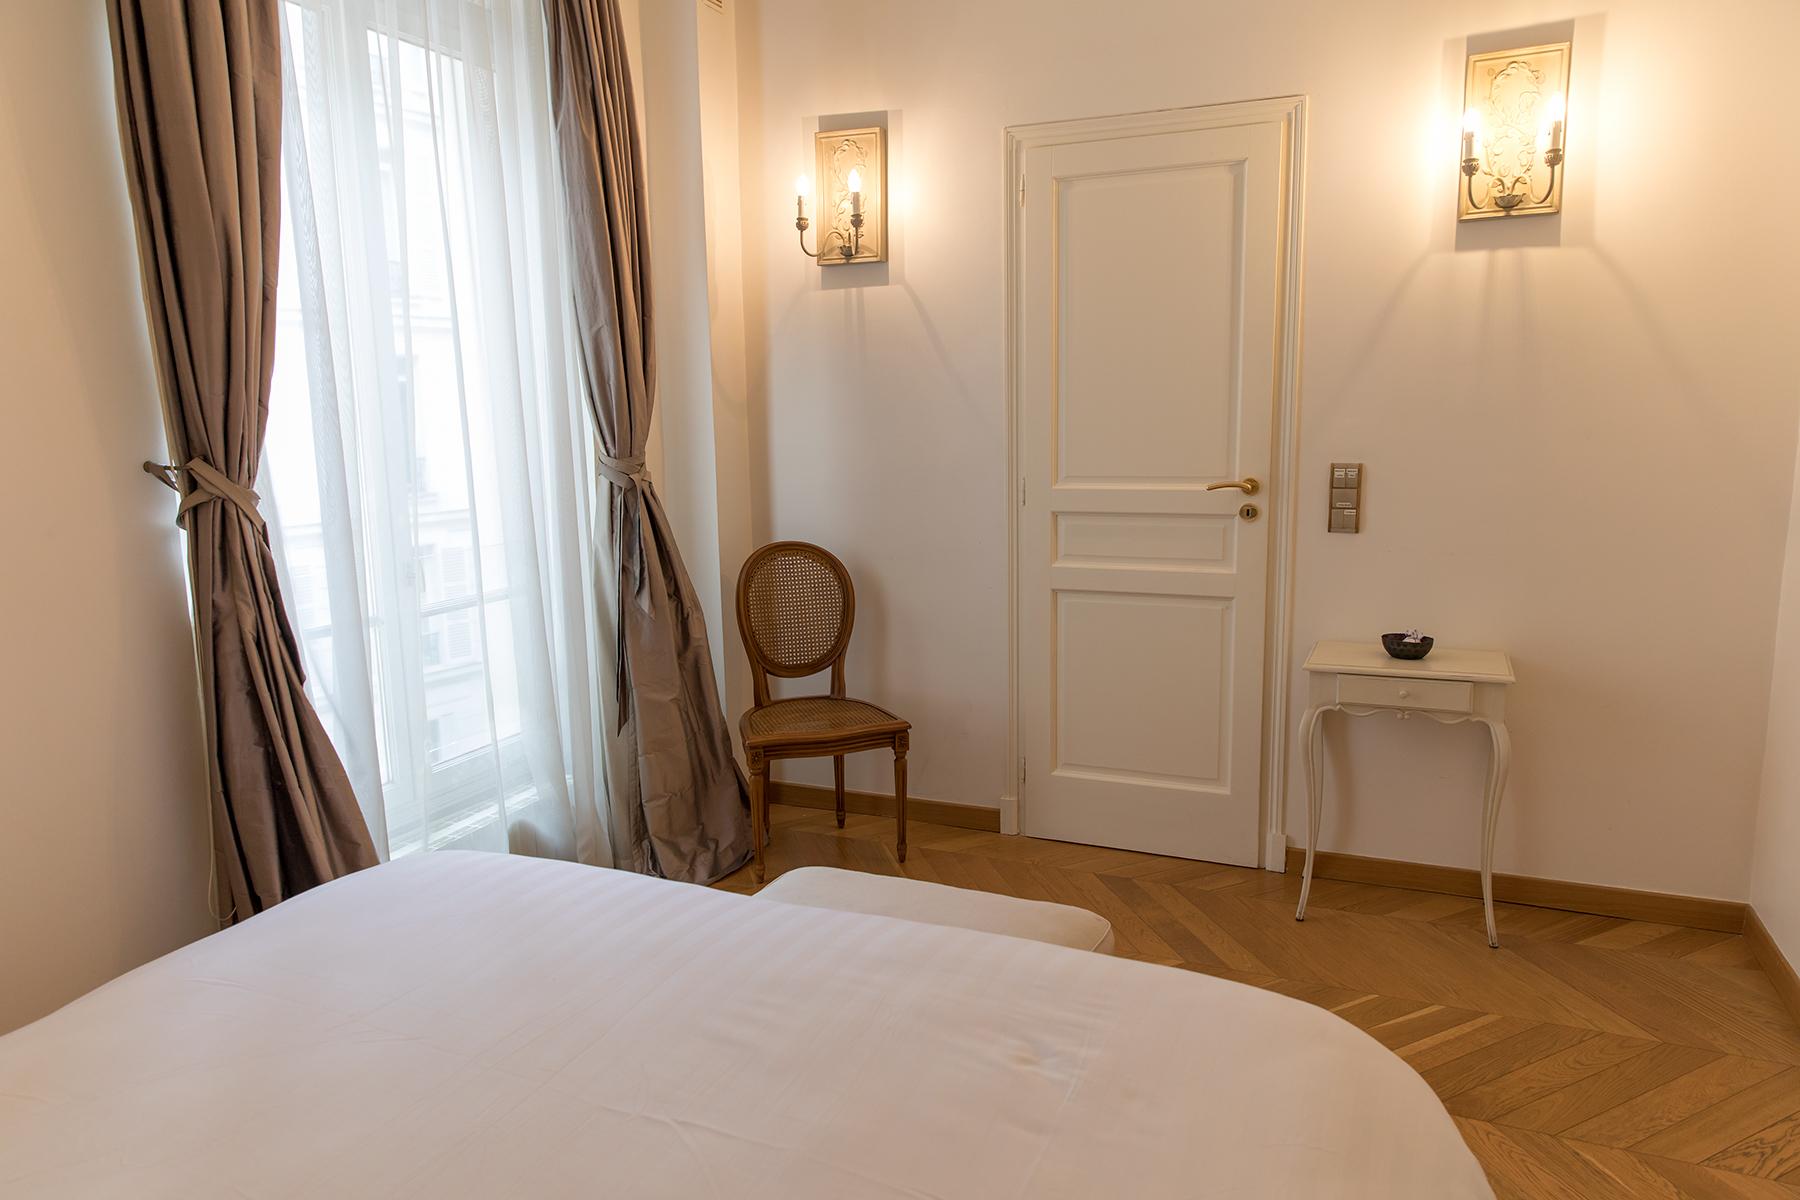 Bright bedroom at Apartment Monceau Chic, 9th Arr, Paris